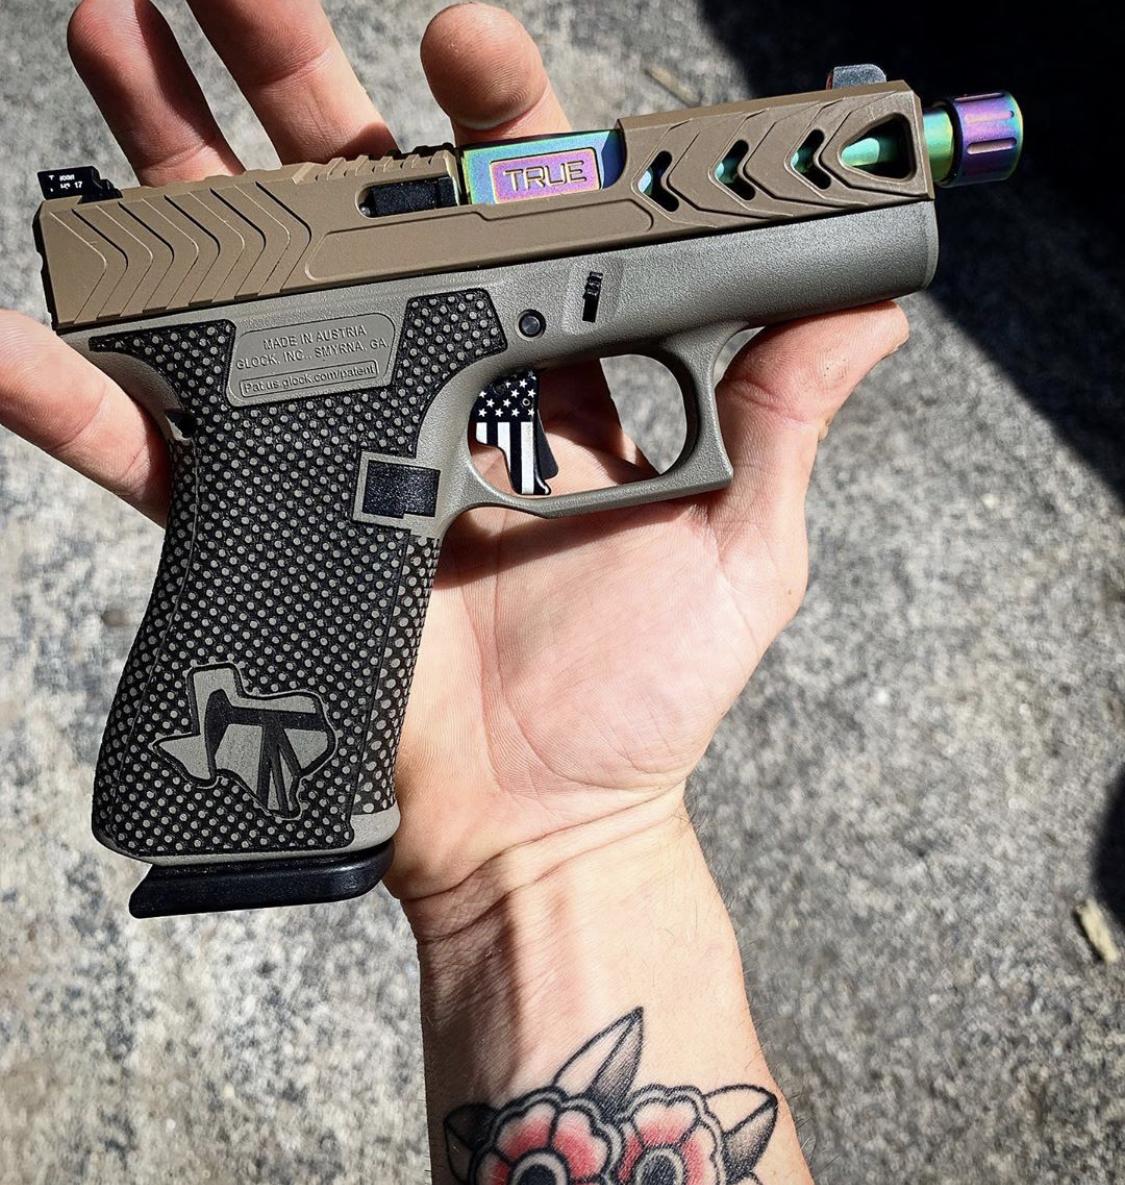 Glock 19 - G19 with custom Cerakote, laser engraving, stippling. Best Custom Gun Shop.